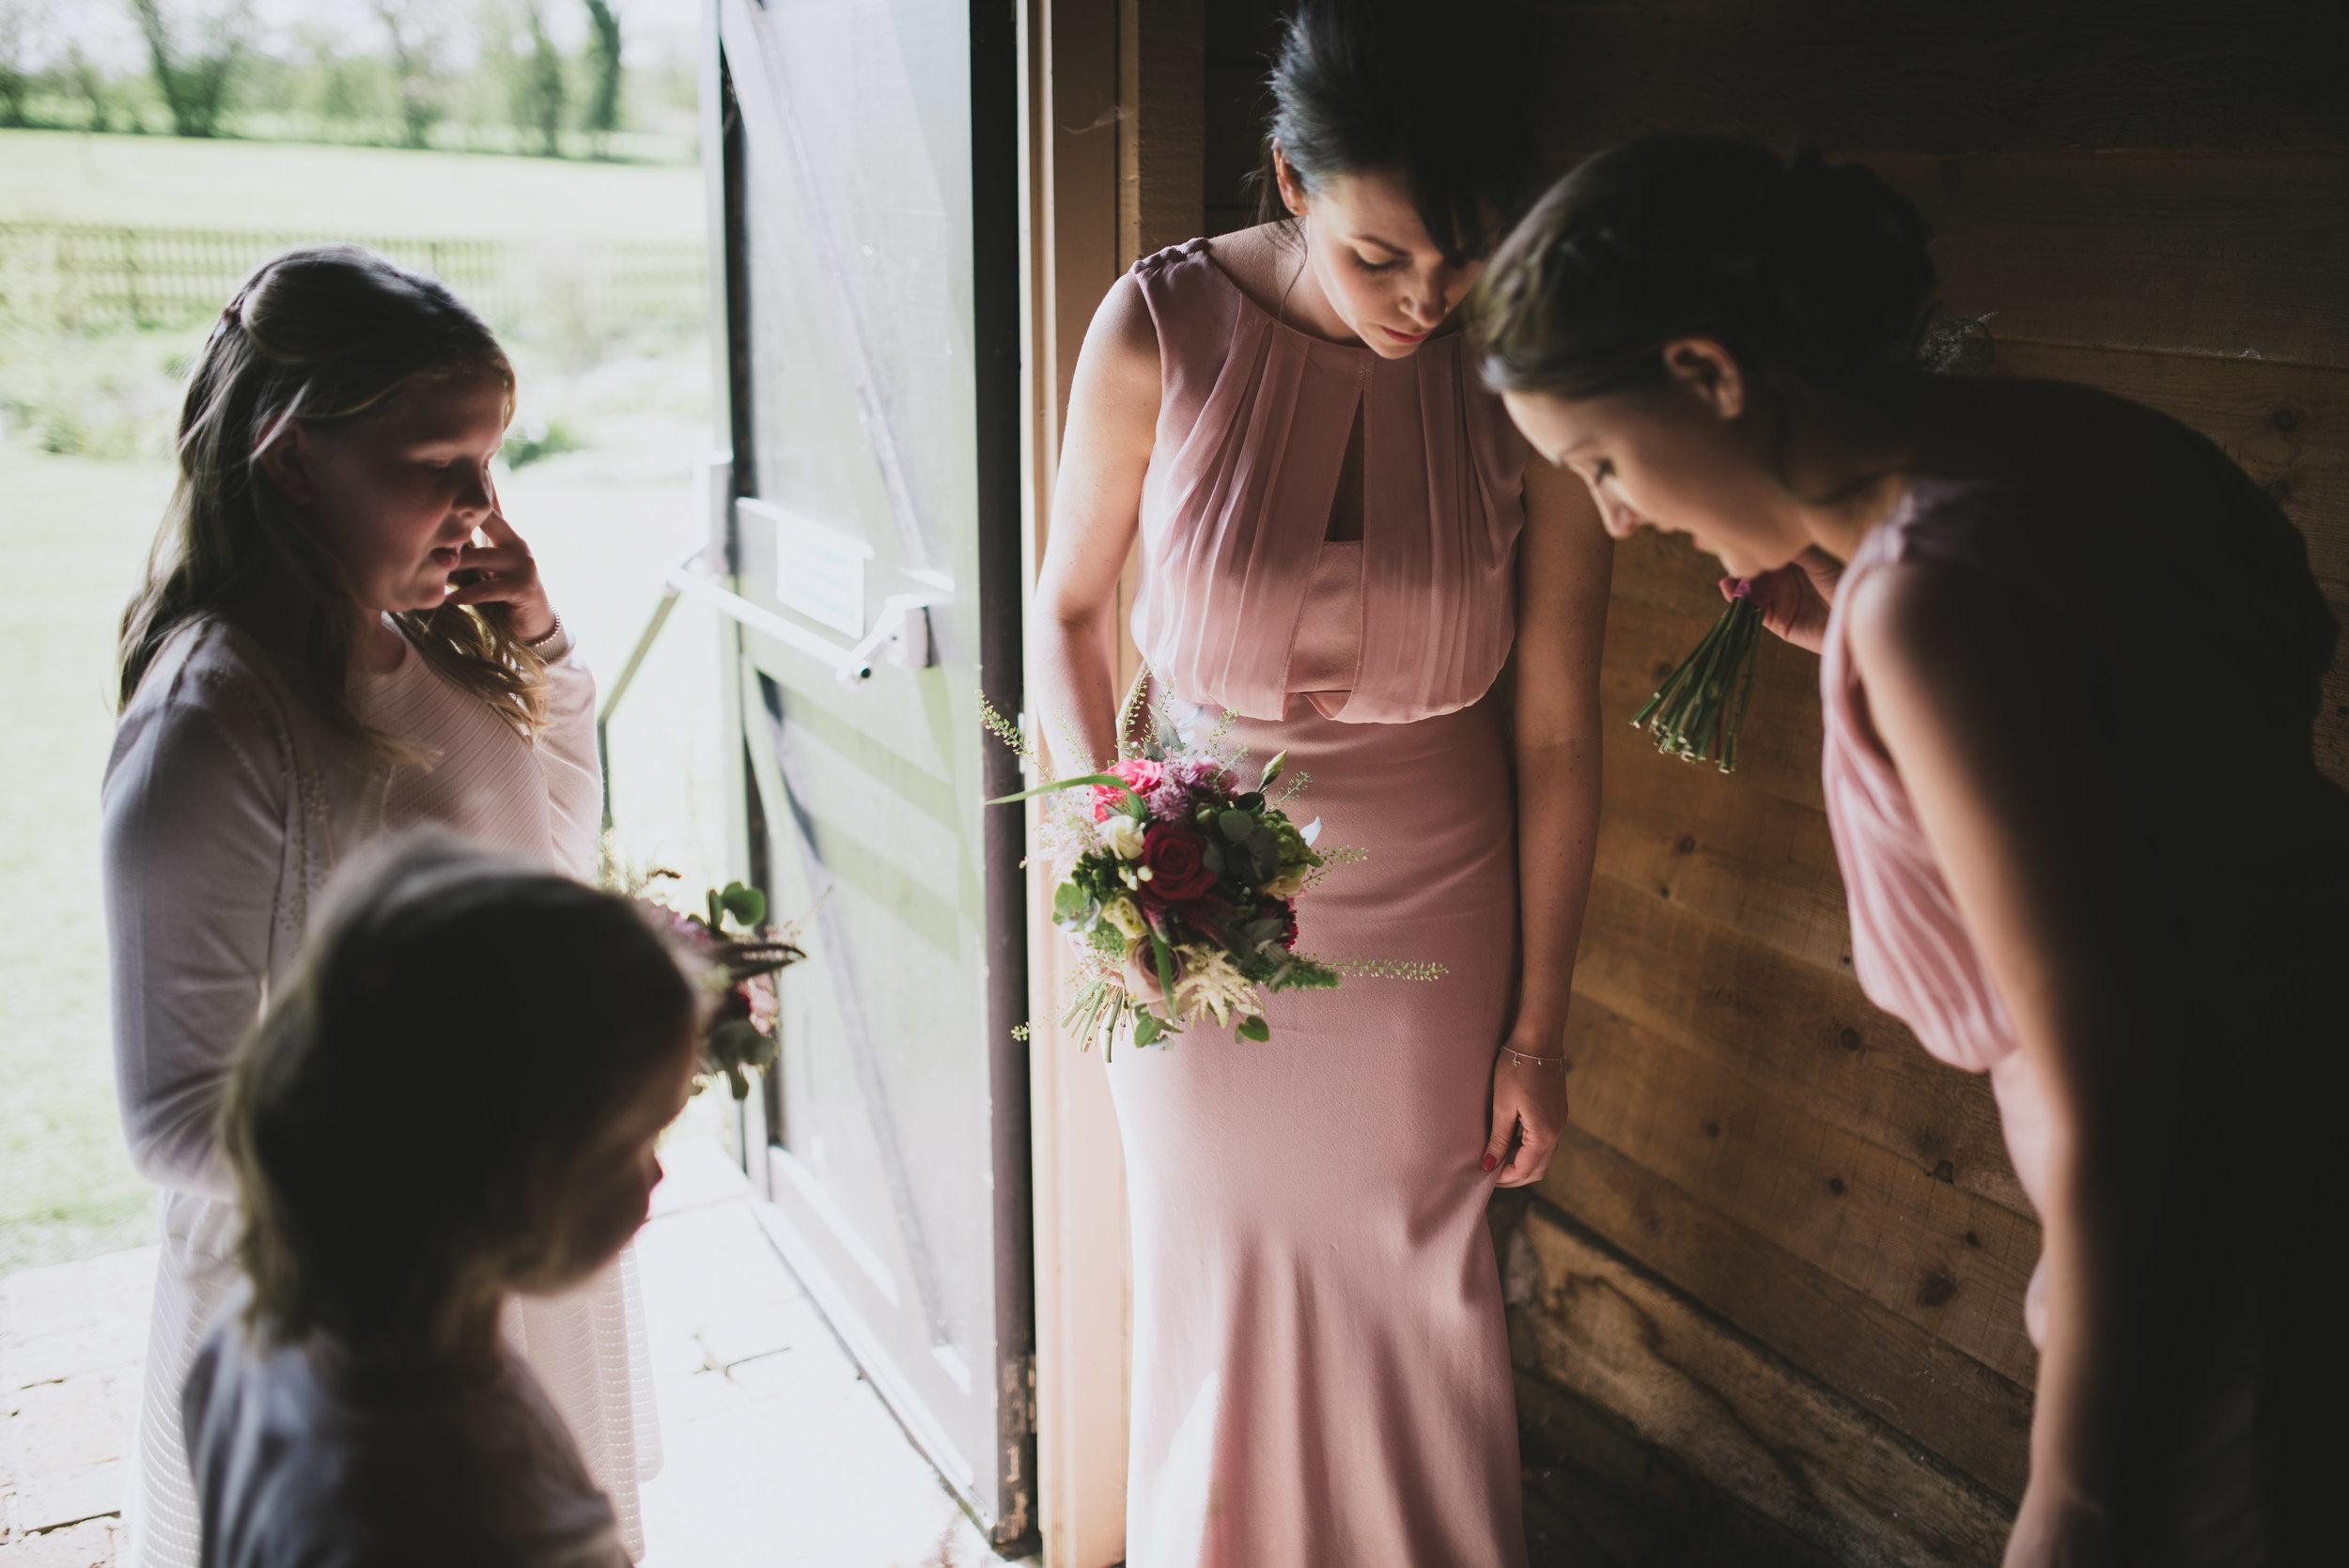 Amy+Hupe+Bridesmaids+2+April+2016.jpg